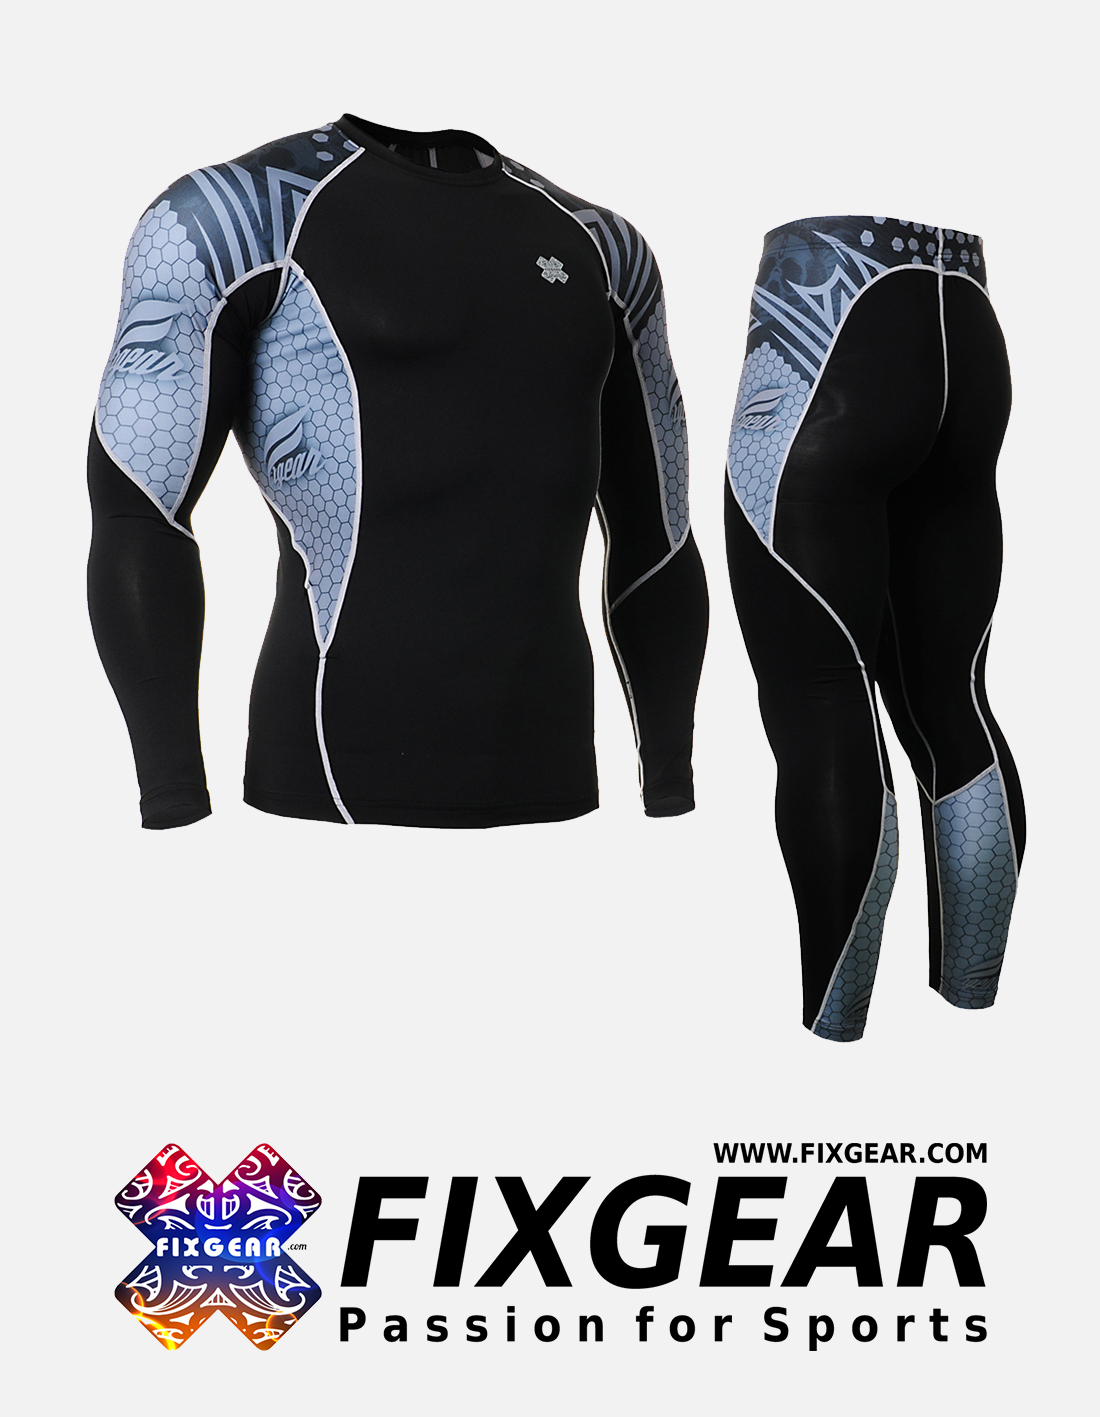 FIXGEAR C2L-P2L-B41 Set Compression Base Layer Shirt & Legging Pants